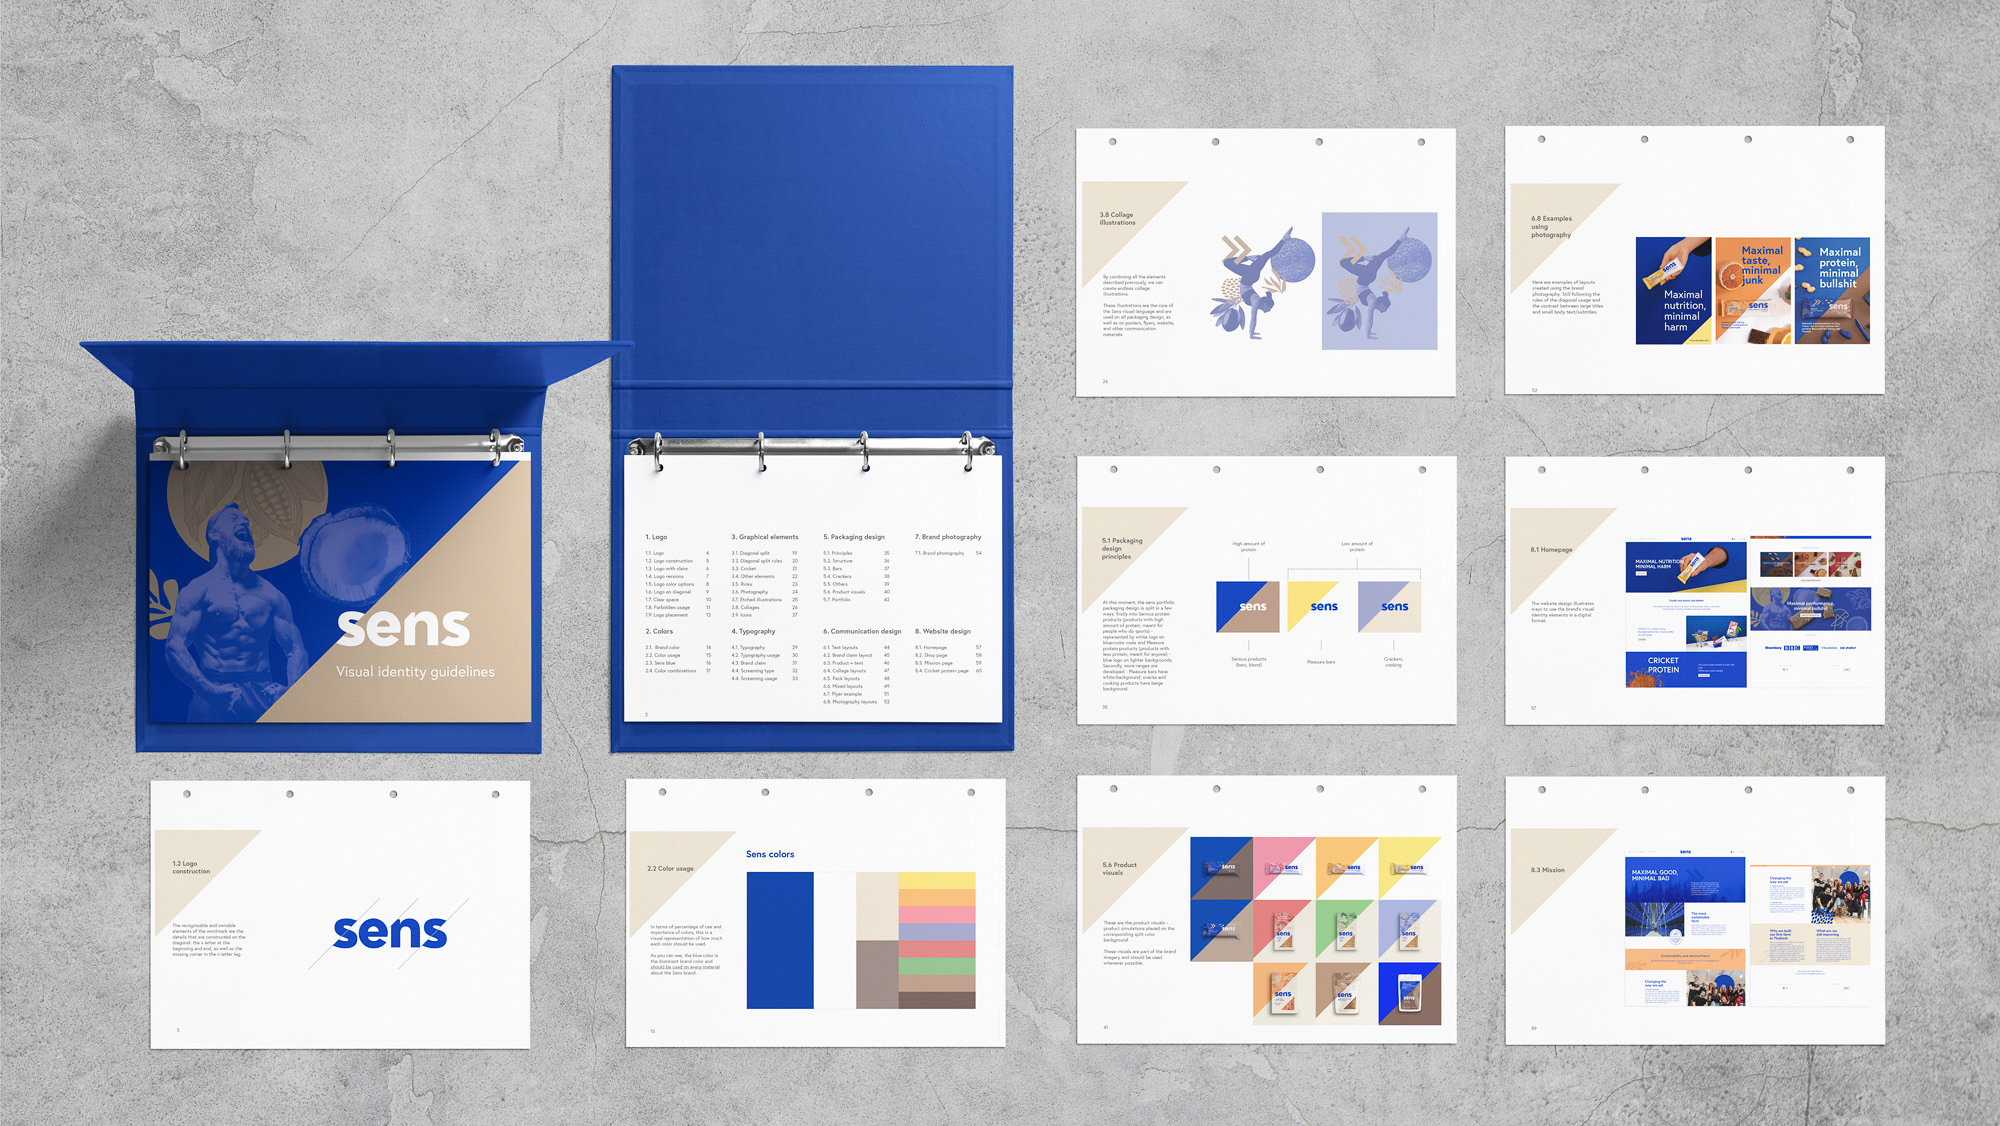 Sens redesign, branding, visual identity, guidelines